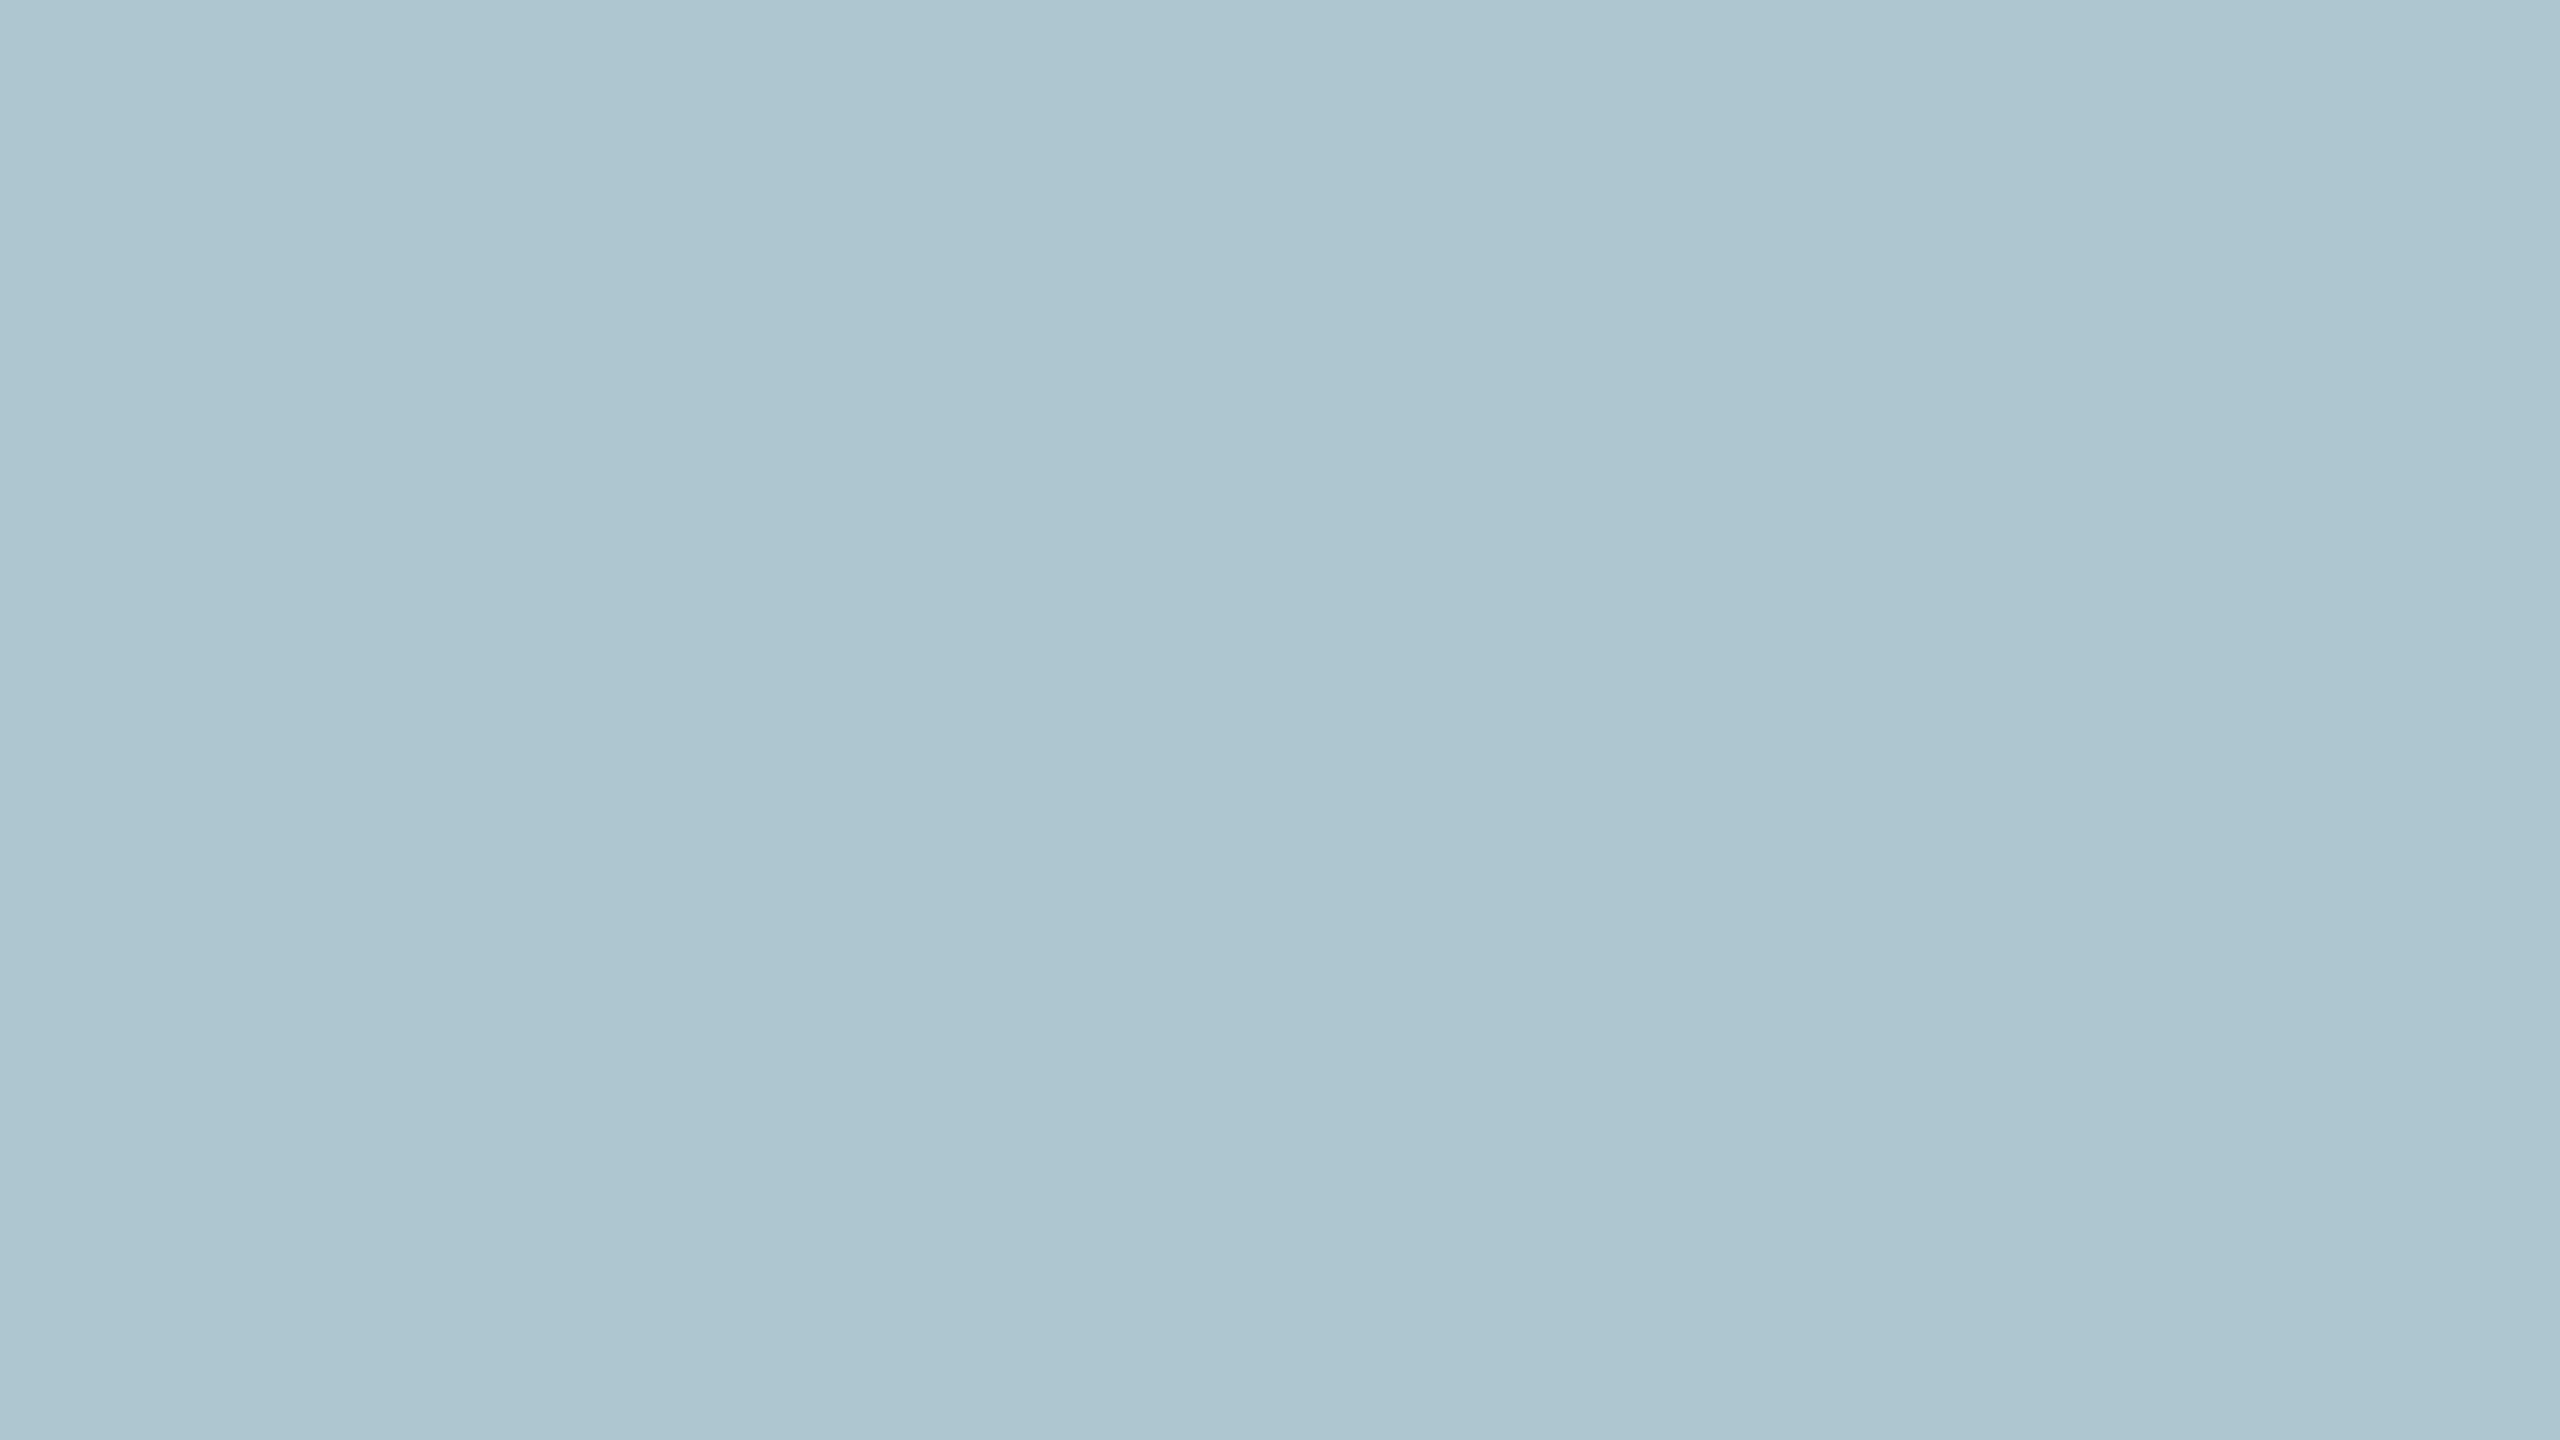 2560x1440 Pastel Blue Solid Color Background